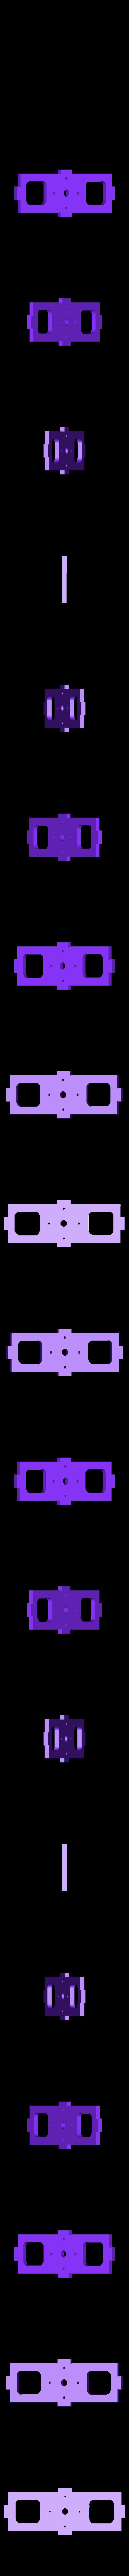 thruster_bracket_vertical.stl Download free STL file OpenROV Underwater Robot • 3D printable design, PortoCruz675